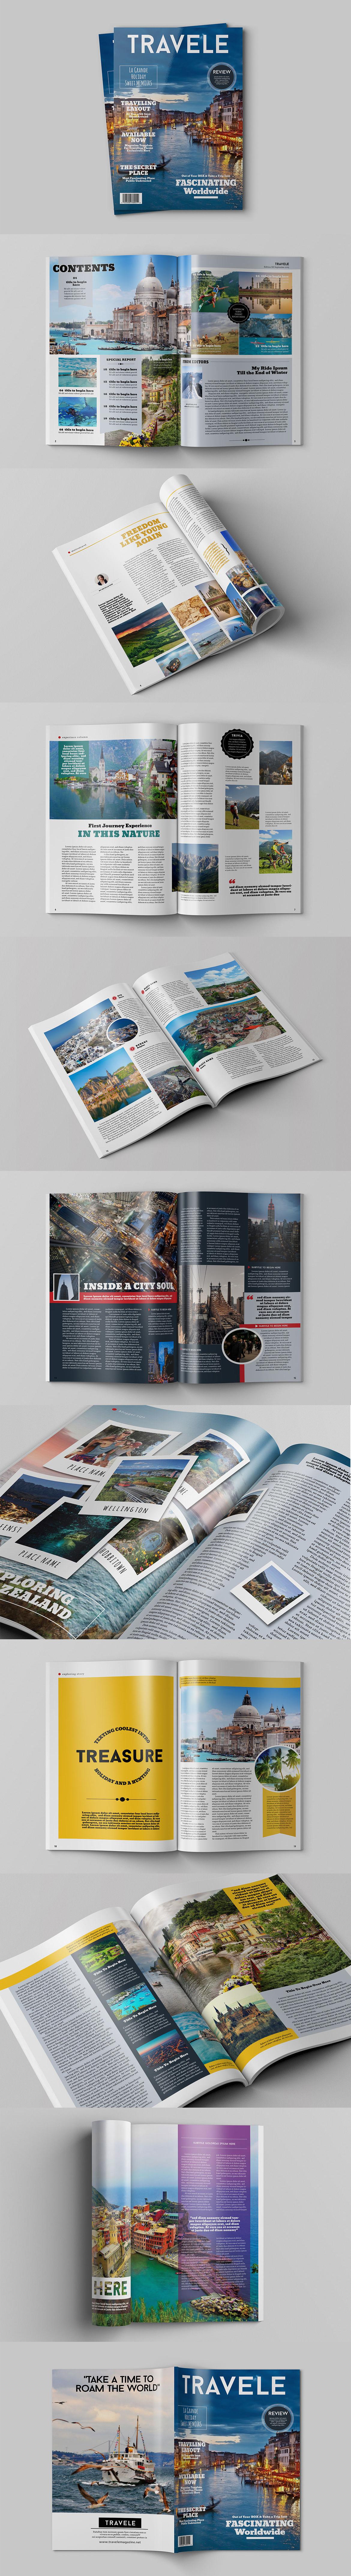 Traveling Magazine Template InDesign INDD | Best Magazine Templates ...